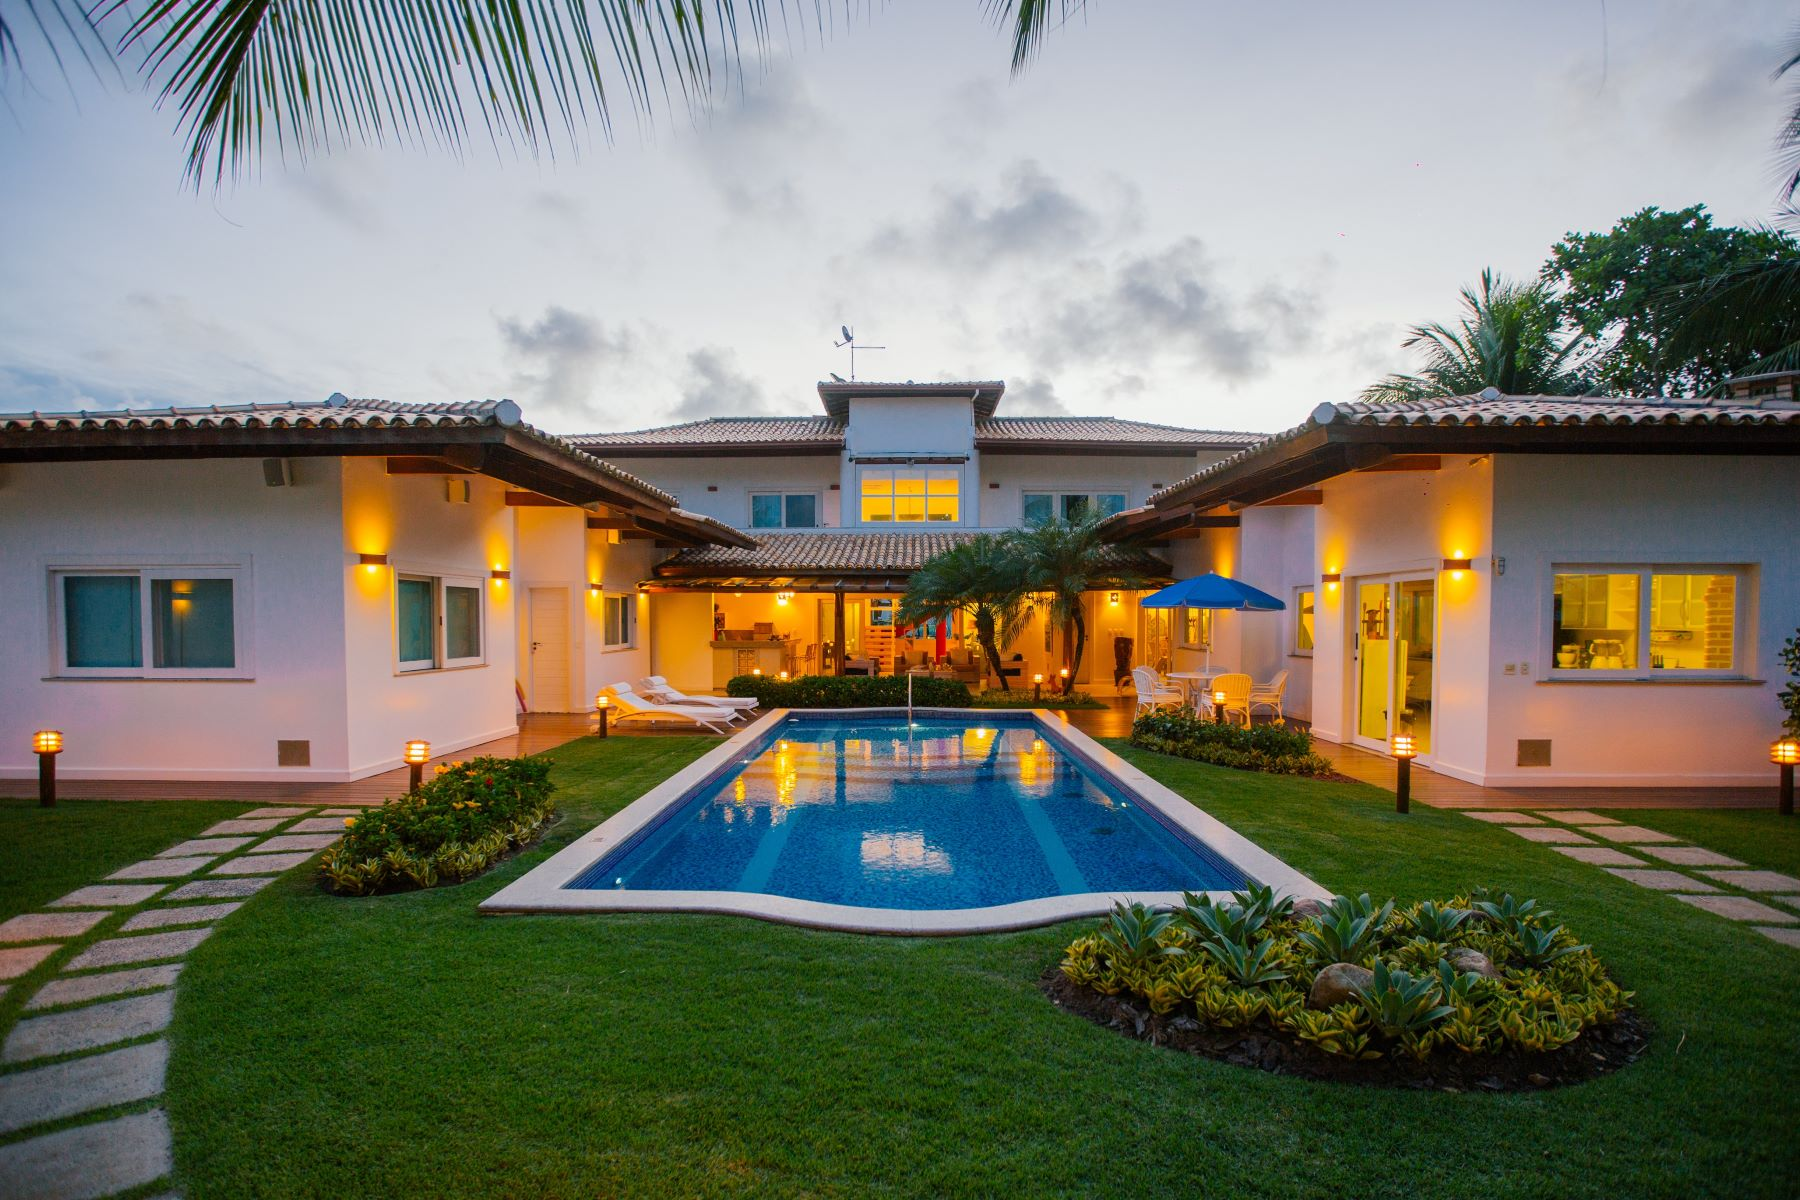 Casa para uma família para Venda às Luxury in the sand Rodovia Ilhéus-olivença, Ilheus, Bahia, 45650000 Brasil